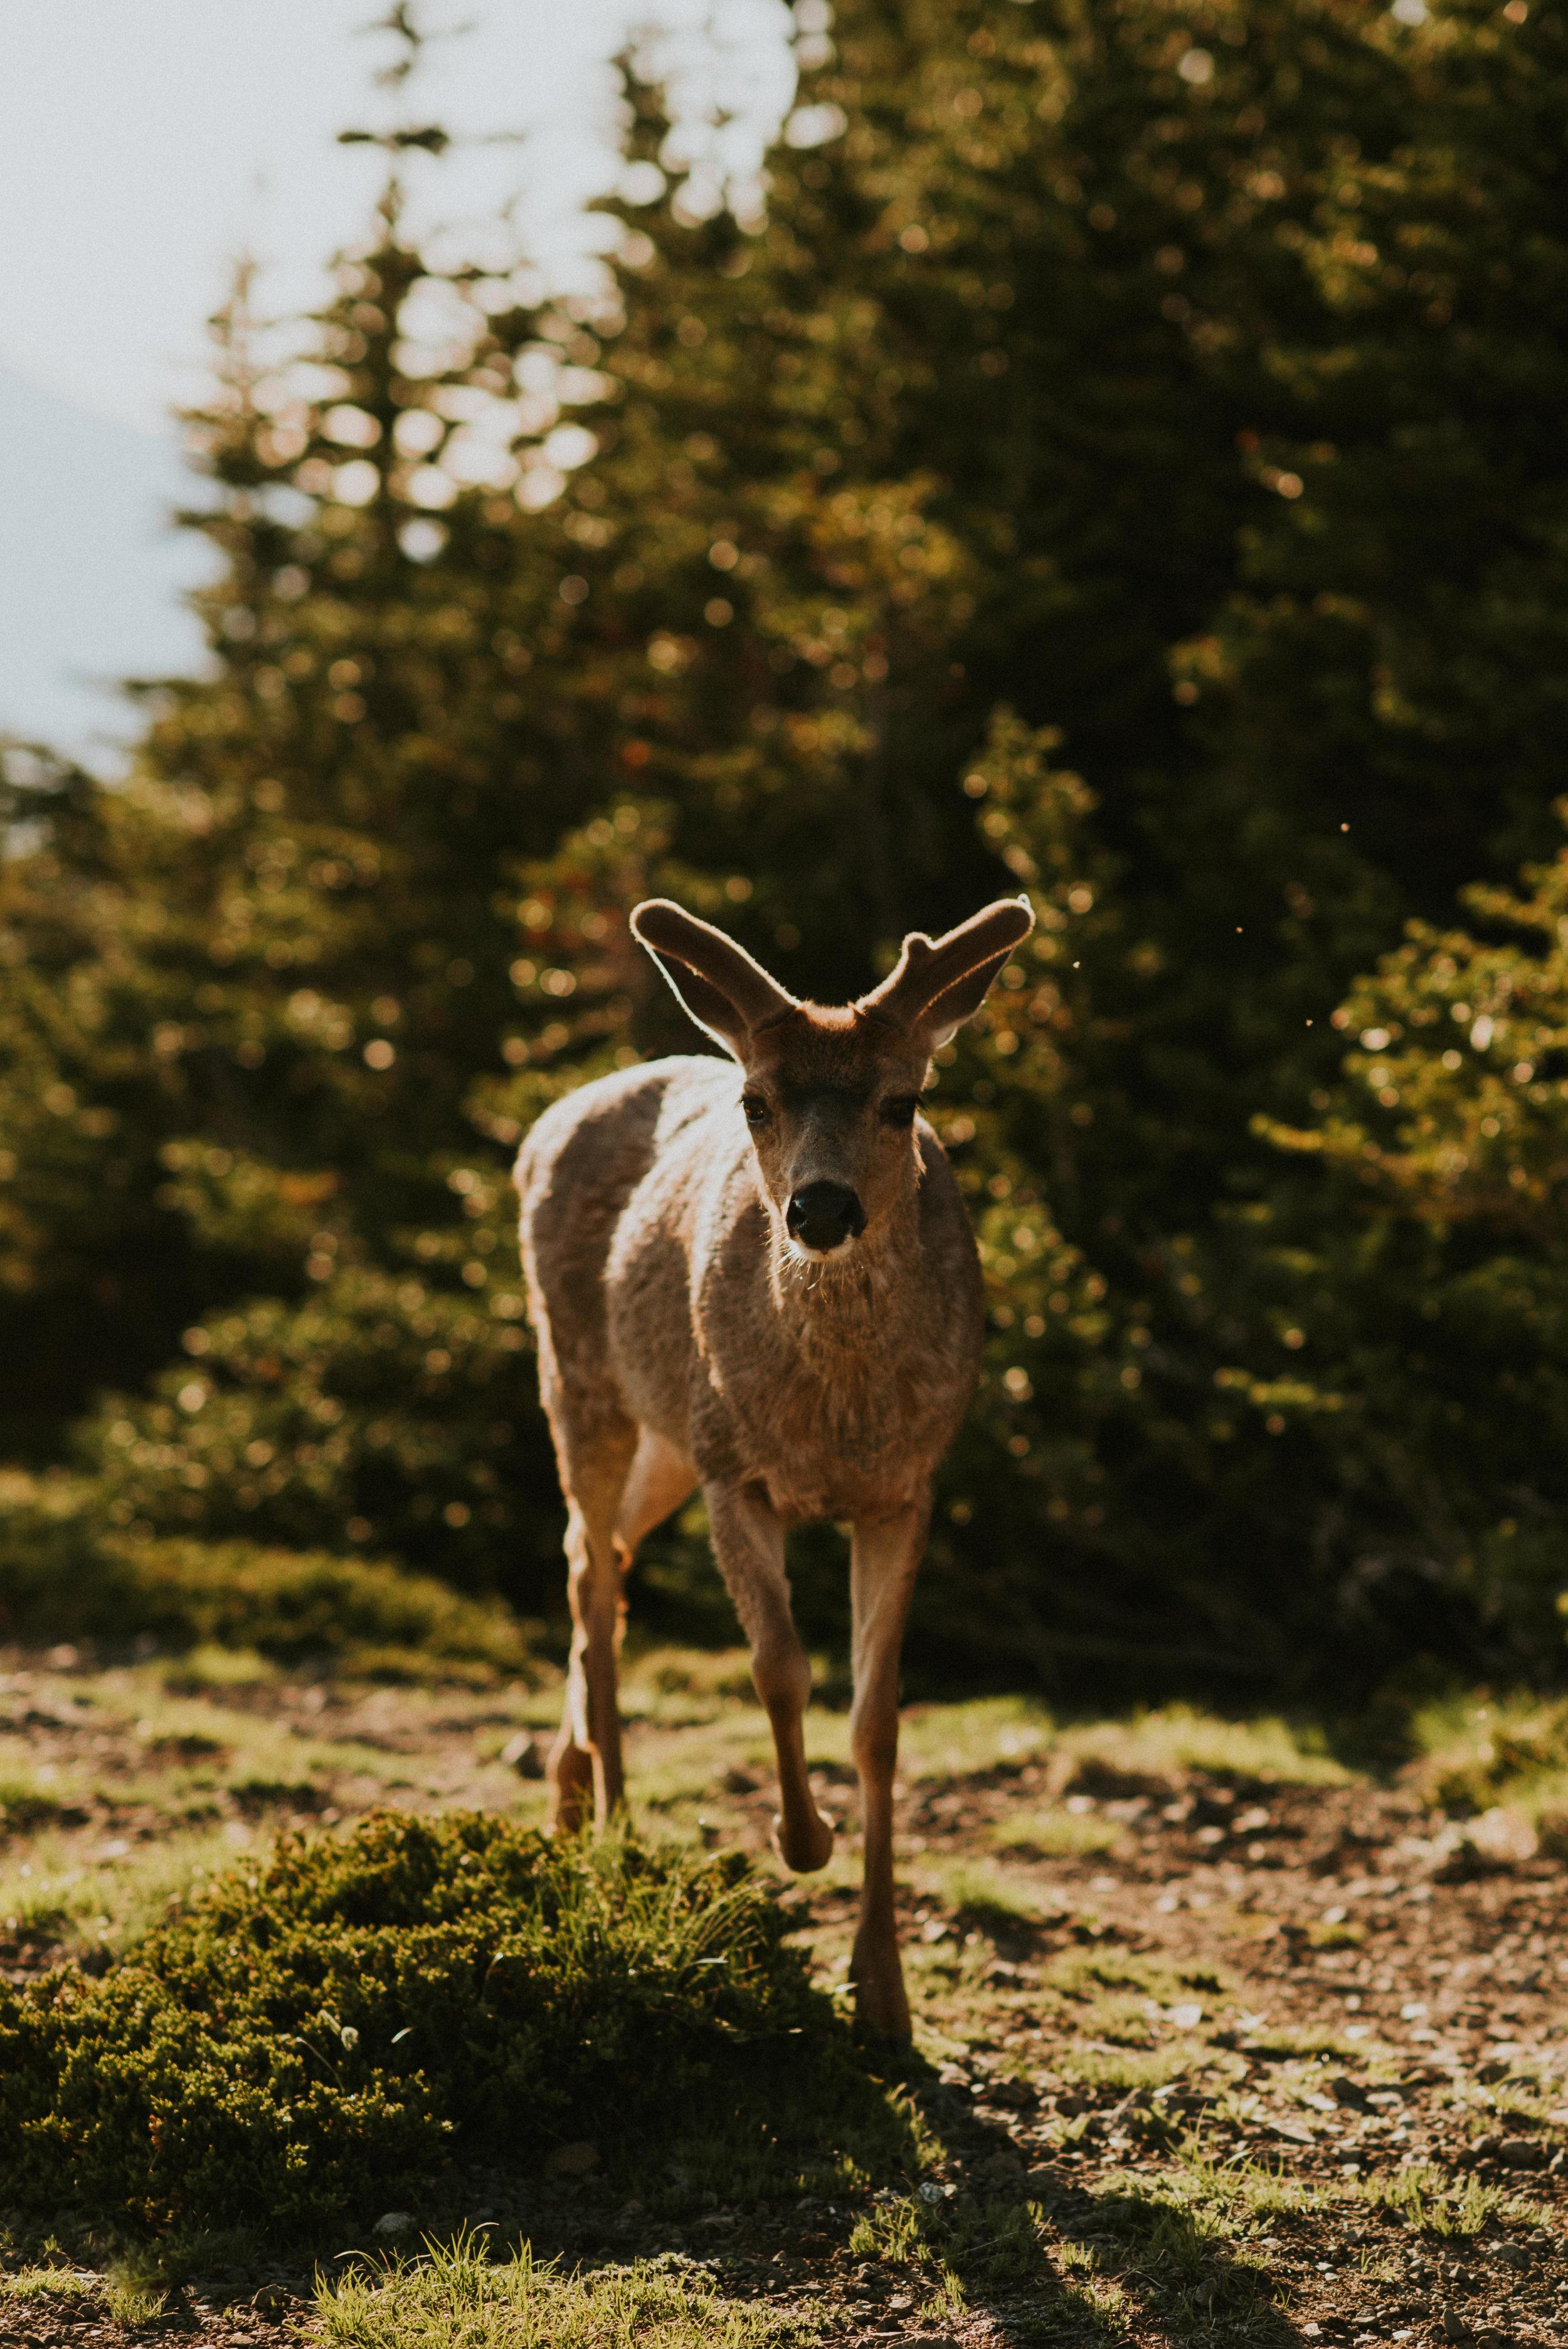 Alaina + Jared - Olympic National Park Elopement - Kamra Fuller Photography-97.jpg